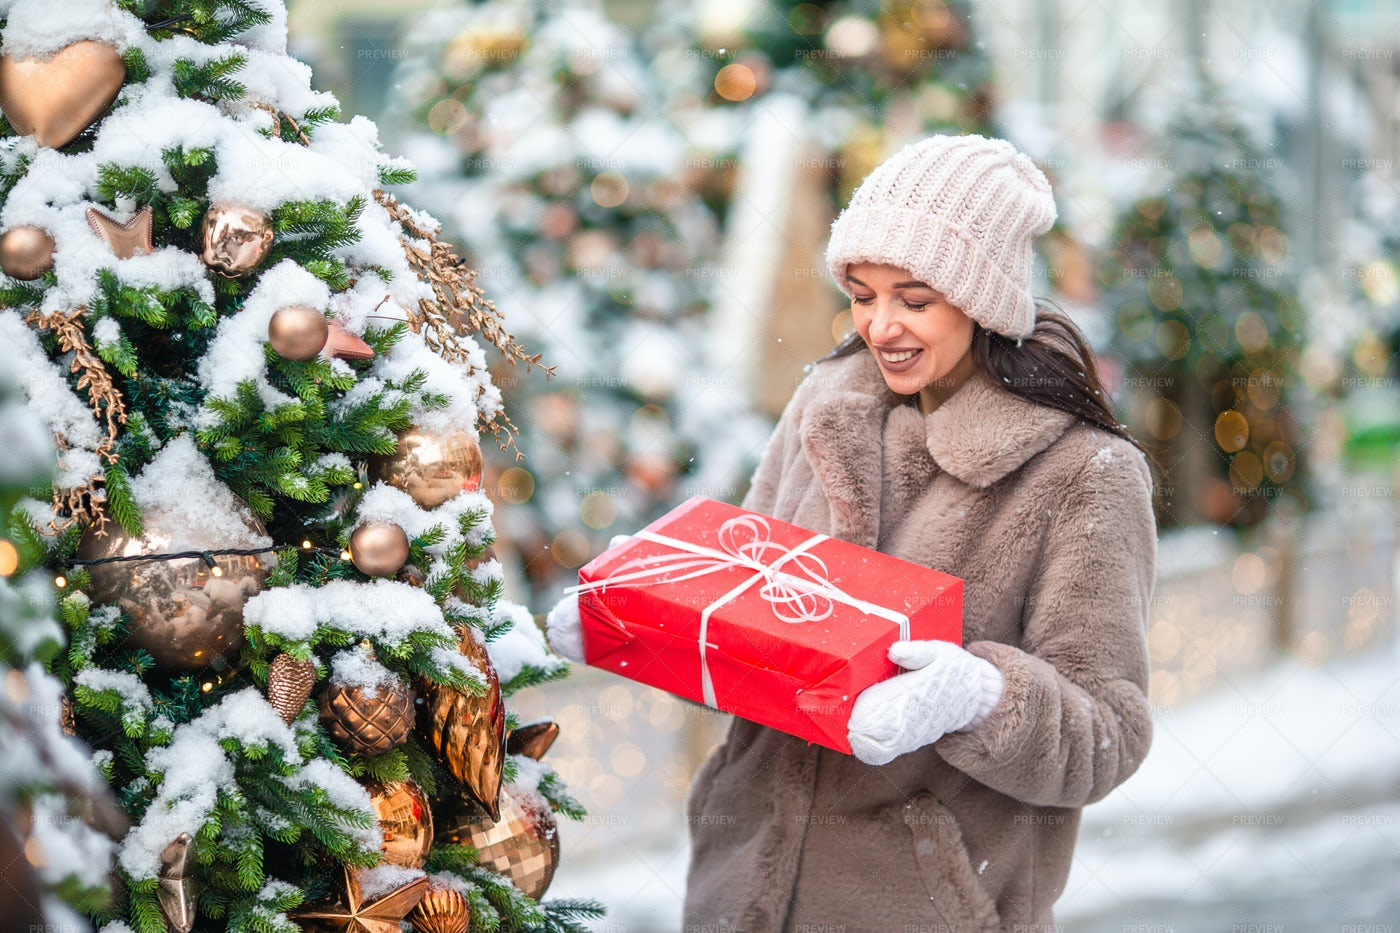 Woman With Christmas Present: Stock Photos